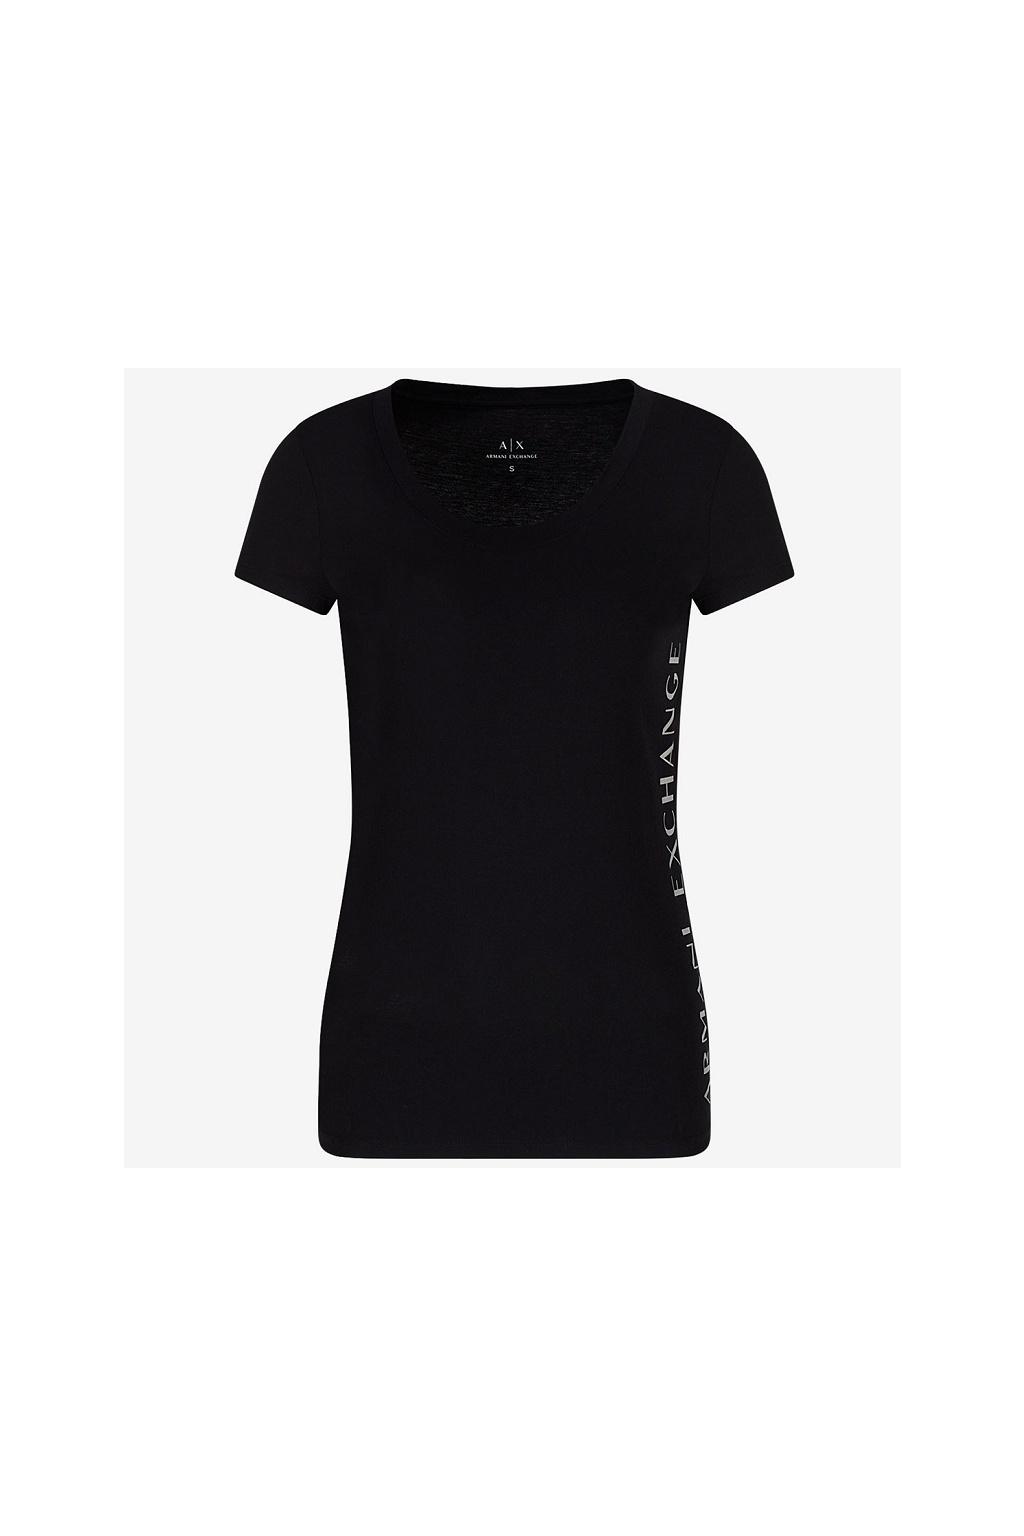 Dámské tričko Armani Exchange 3KYTGU YJW1Z černé